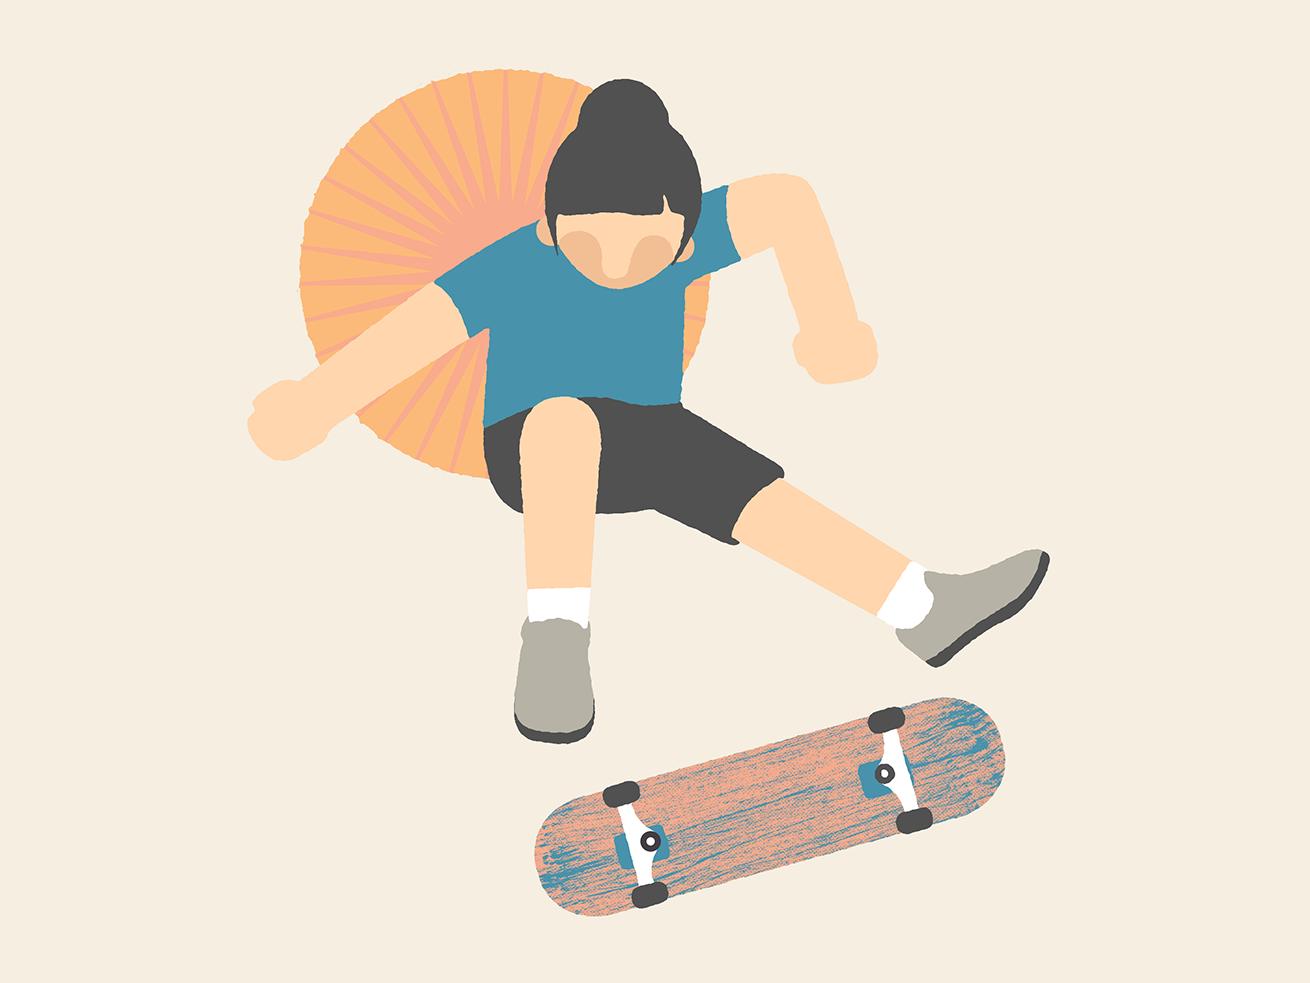 Kickflip textures simple skateboard skate star sun flat design girl illustration mexico guadalajara